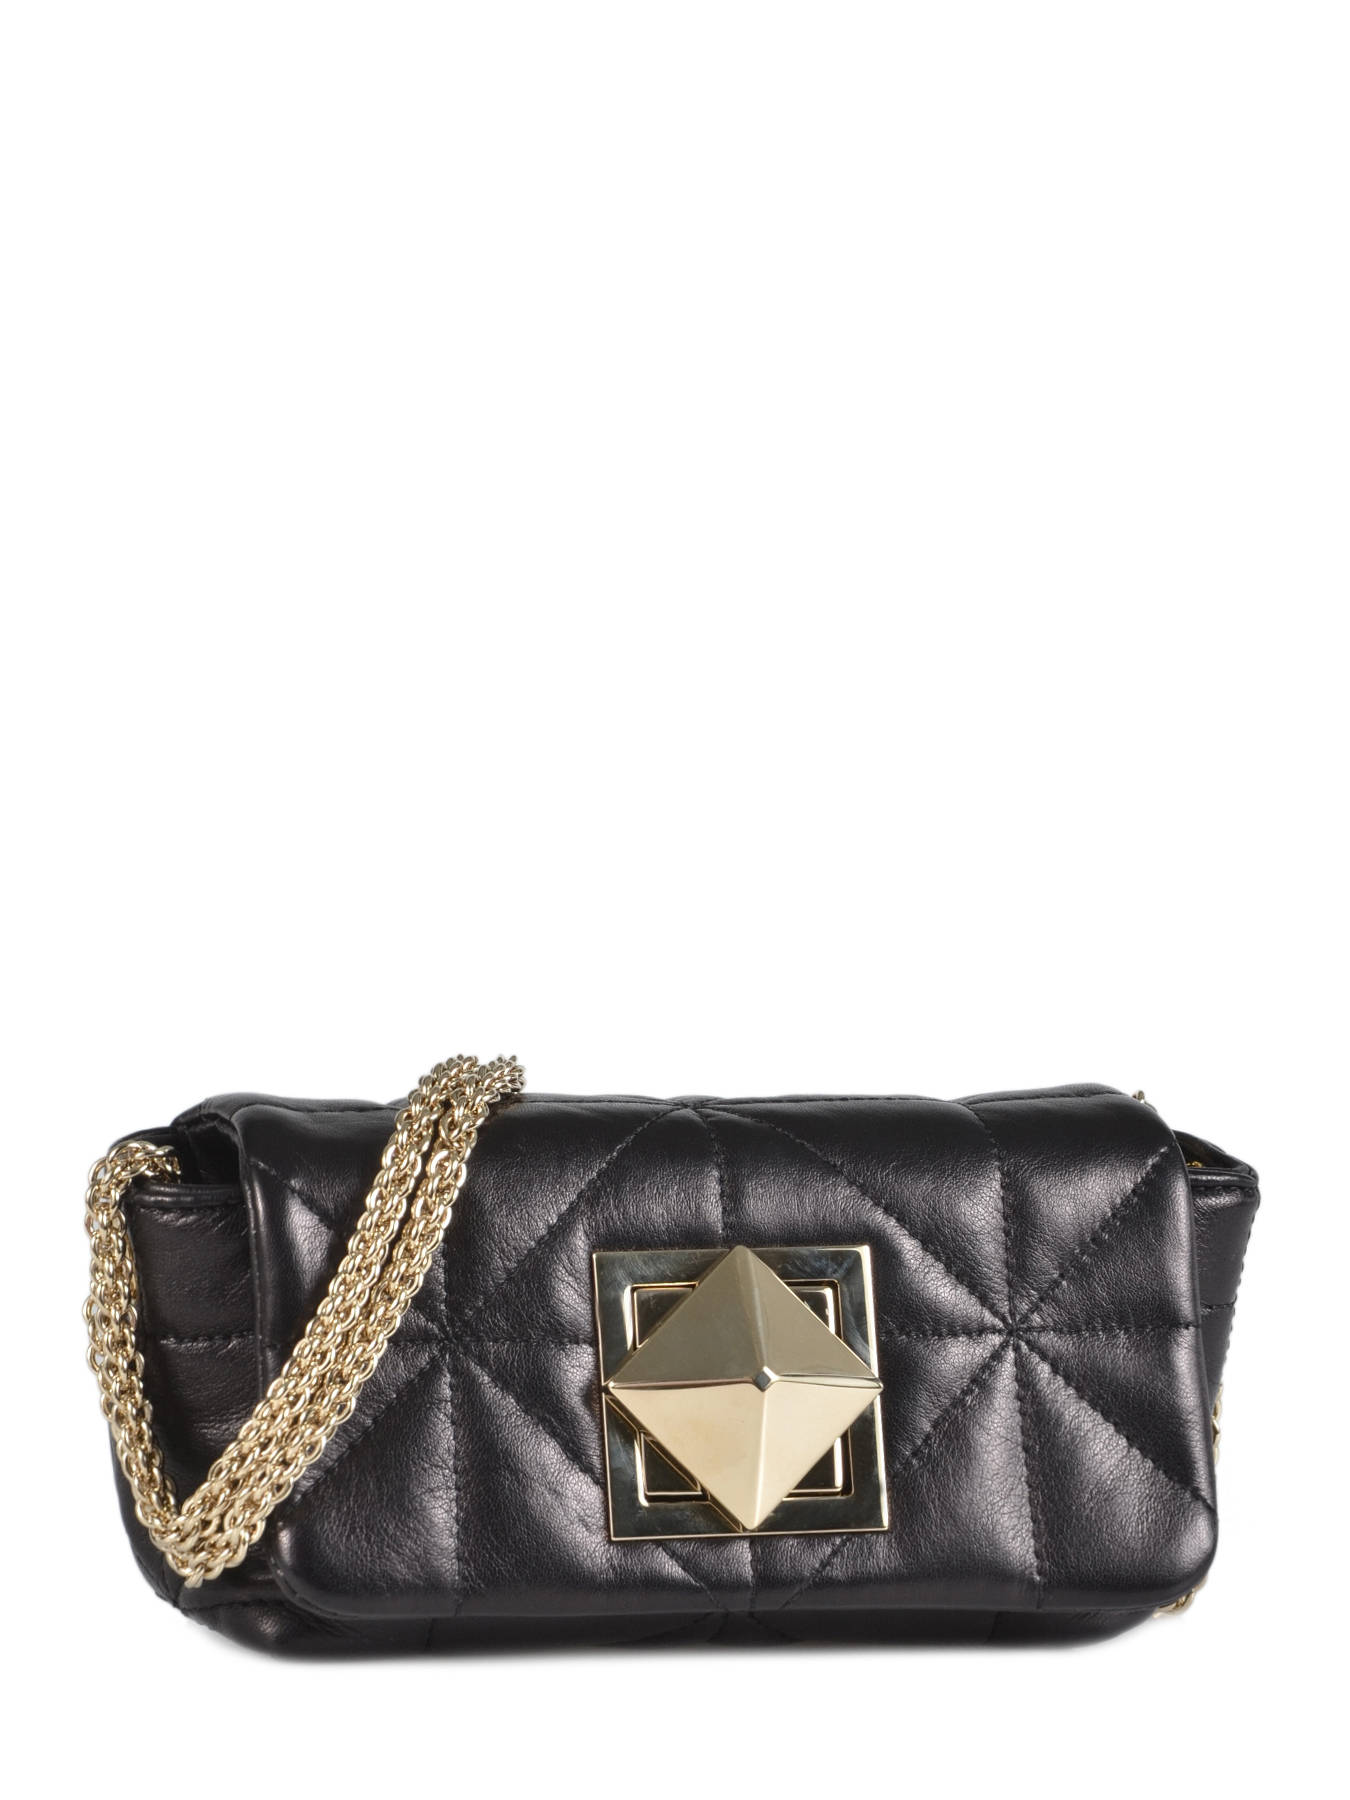 aca1fe6ecaa ... Crossbody Bag Copain Leather Sonia rykiel Black copain 8446-43 ...